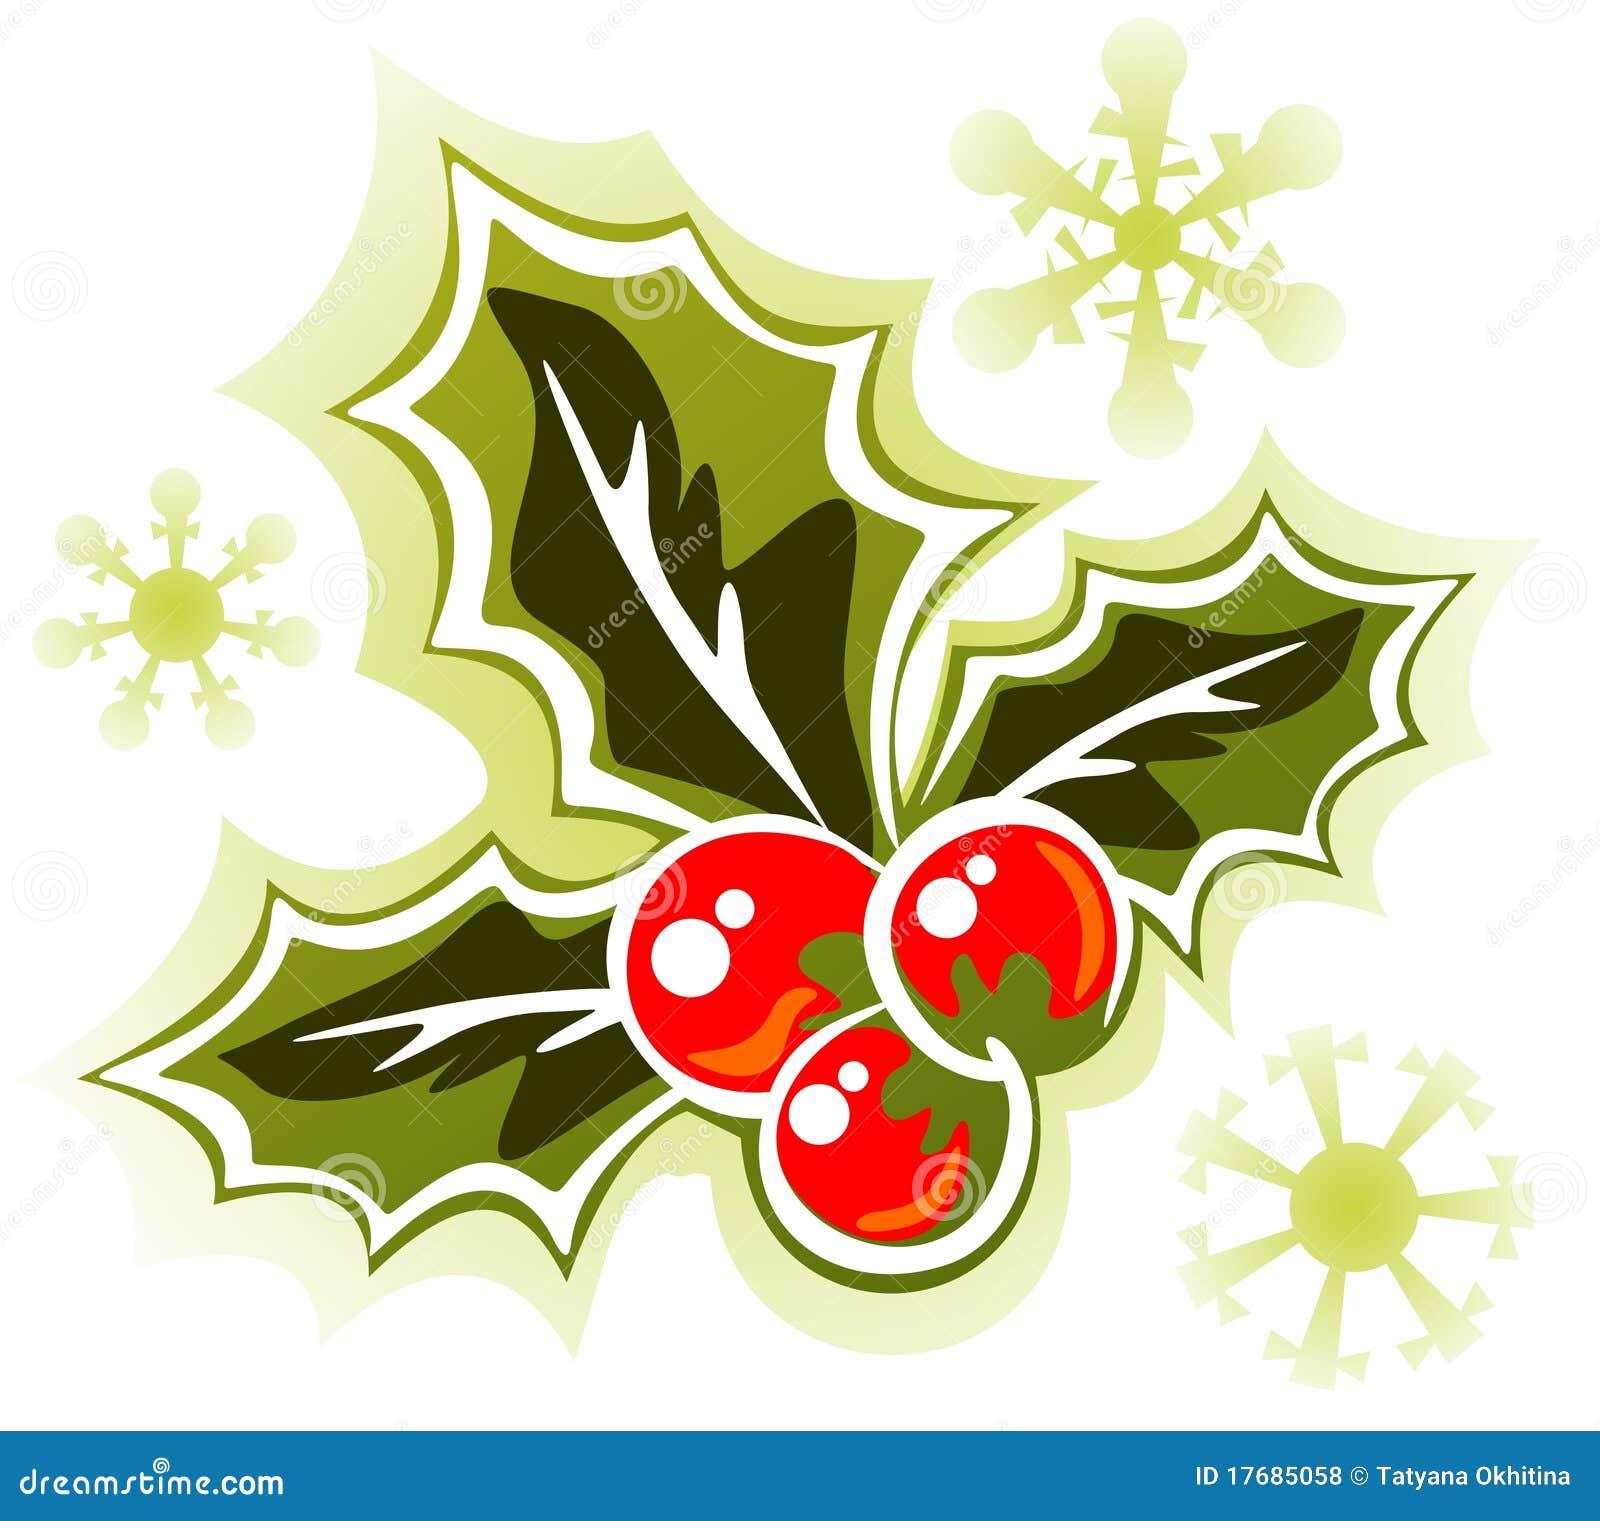 Jagodowy holly